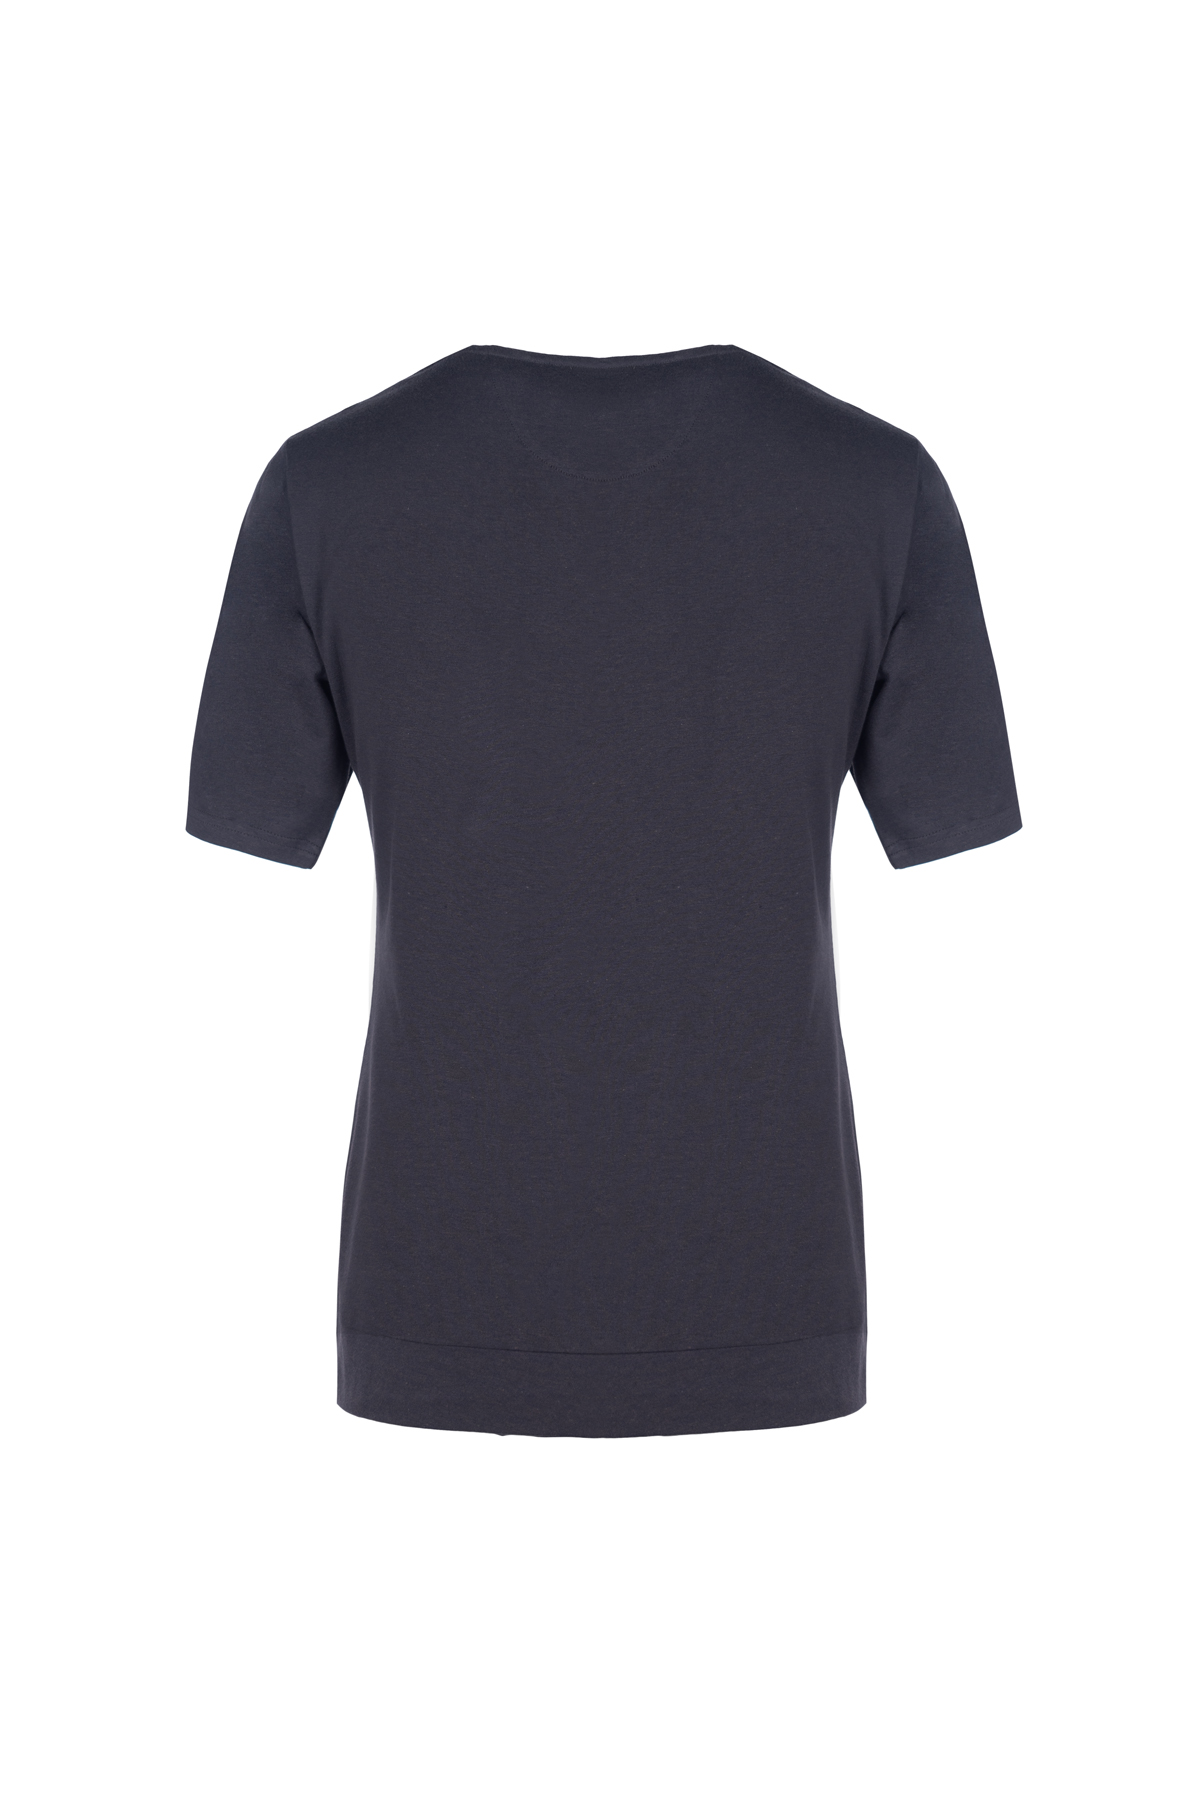 Soquesto  Shirt Kerstina